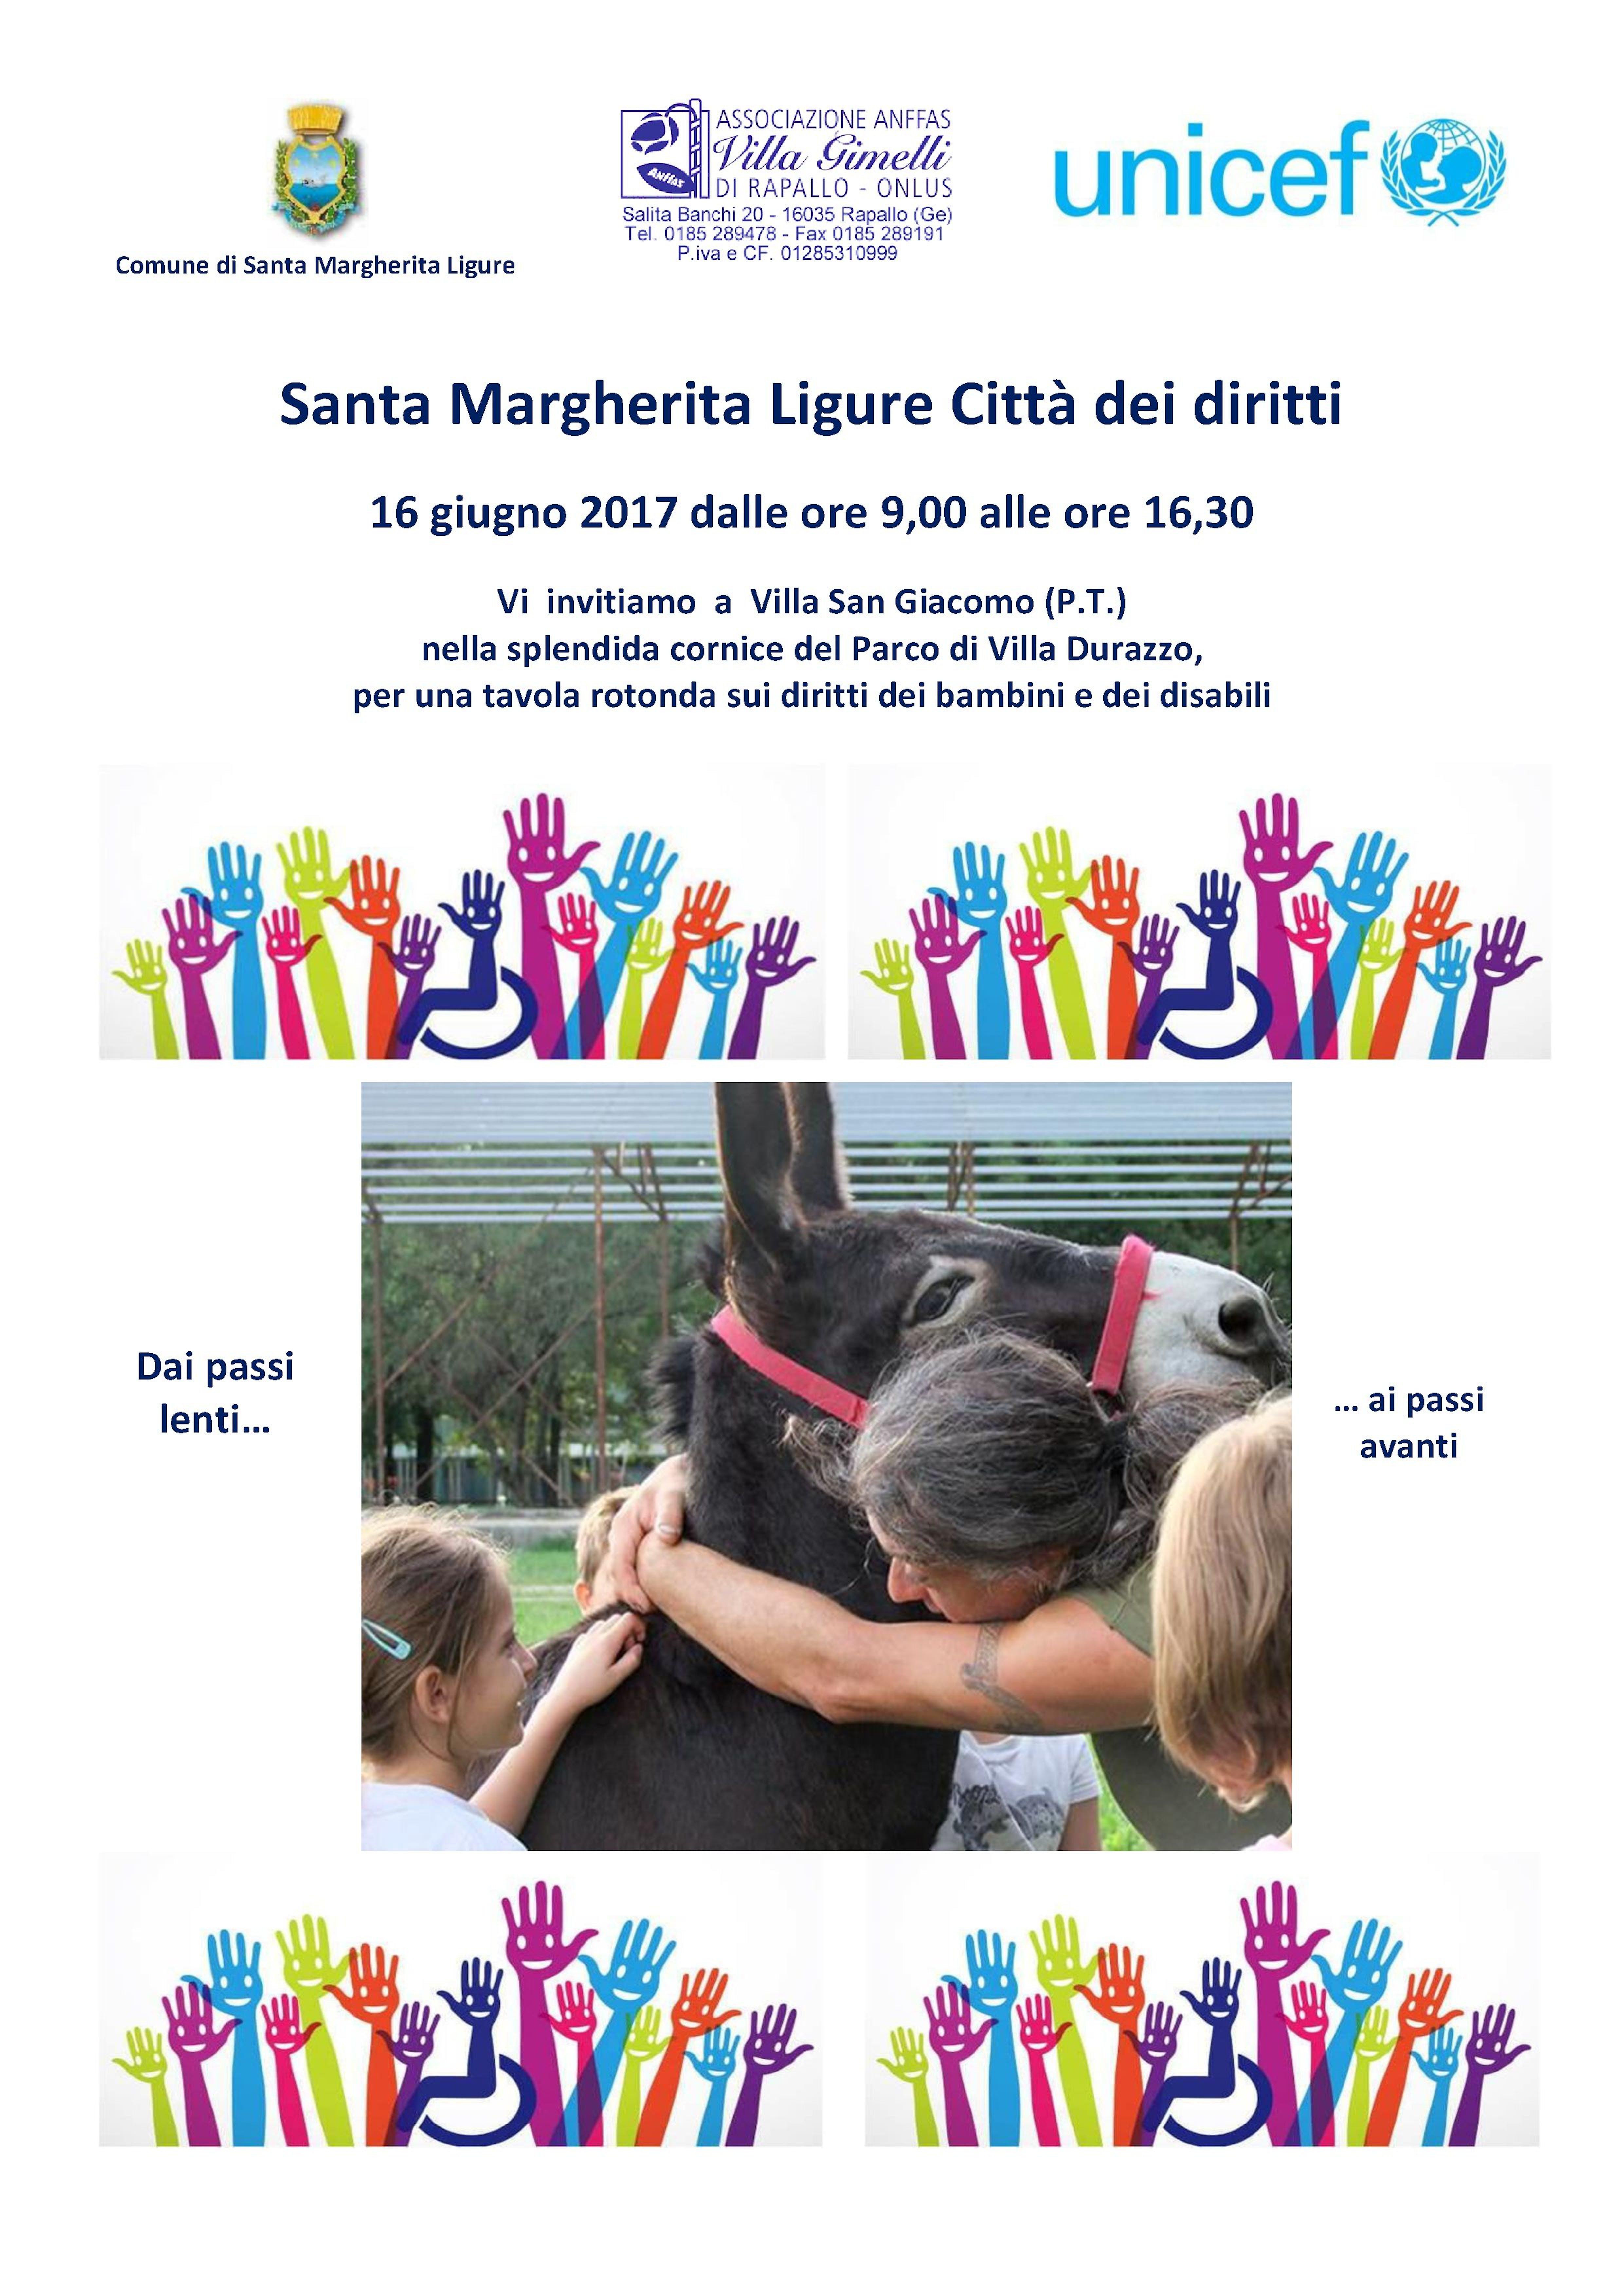 Santa Margherita Ligure, città dei diritti